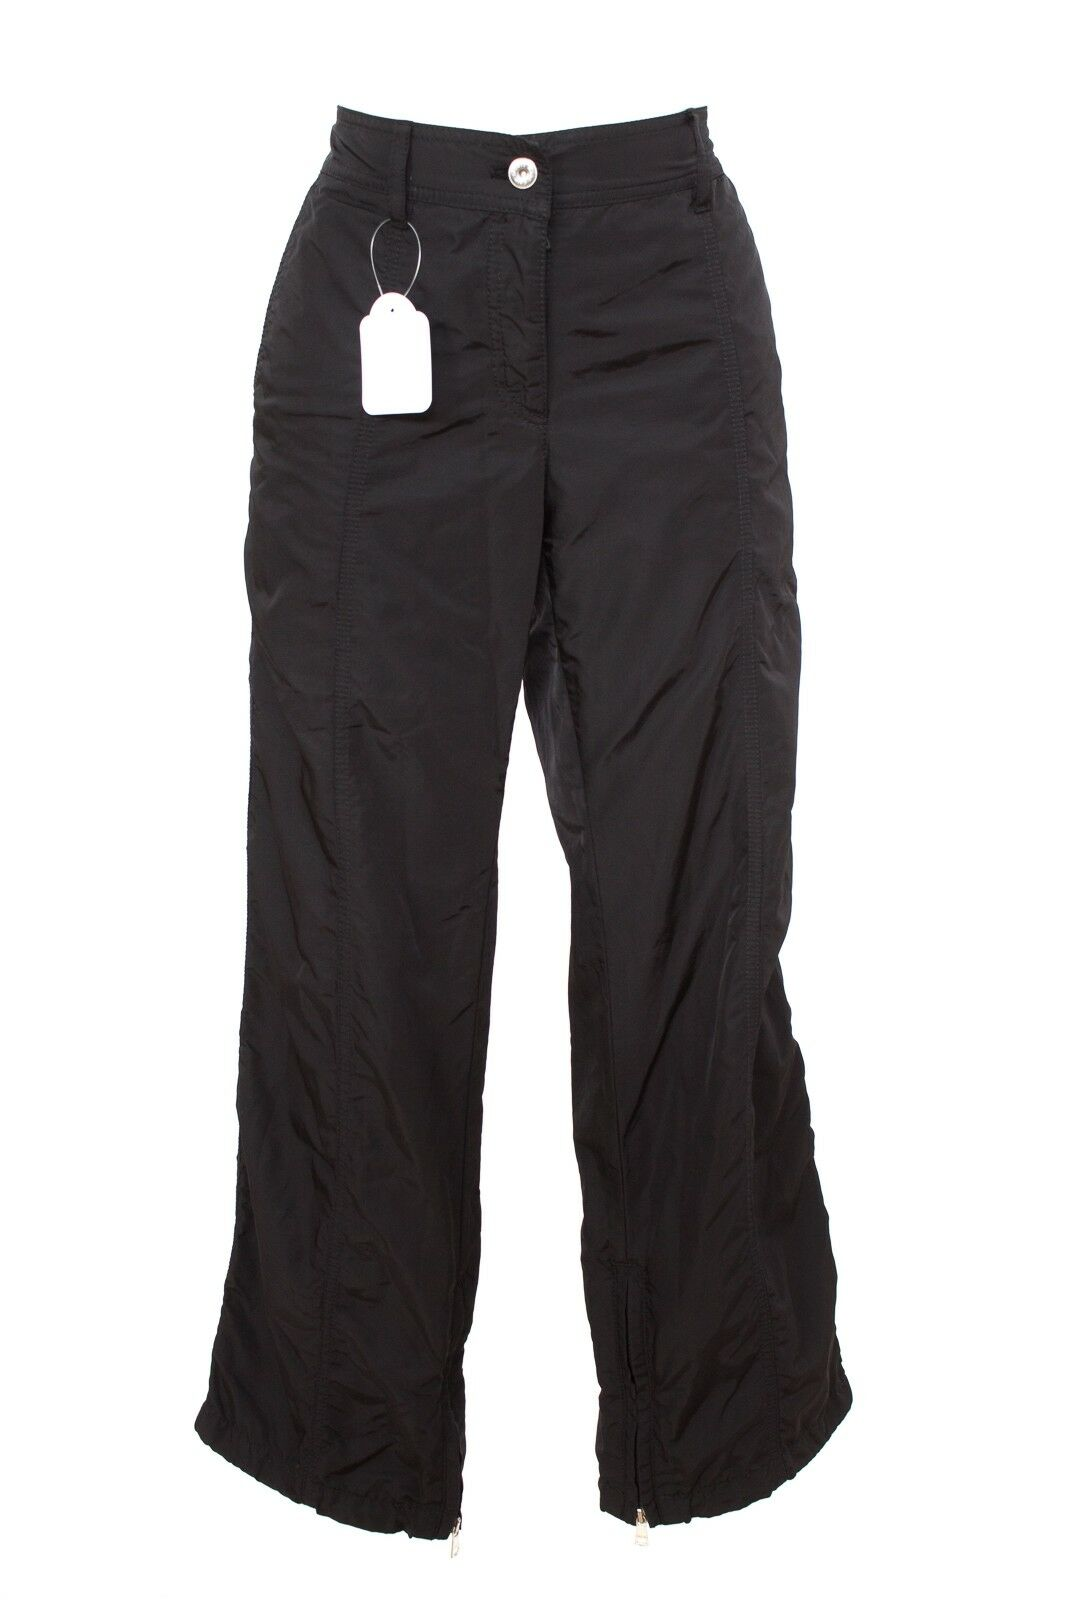 MARCCAIN Hose Gr. M Outdoor Freizeithose Trousers Pants